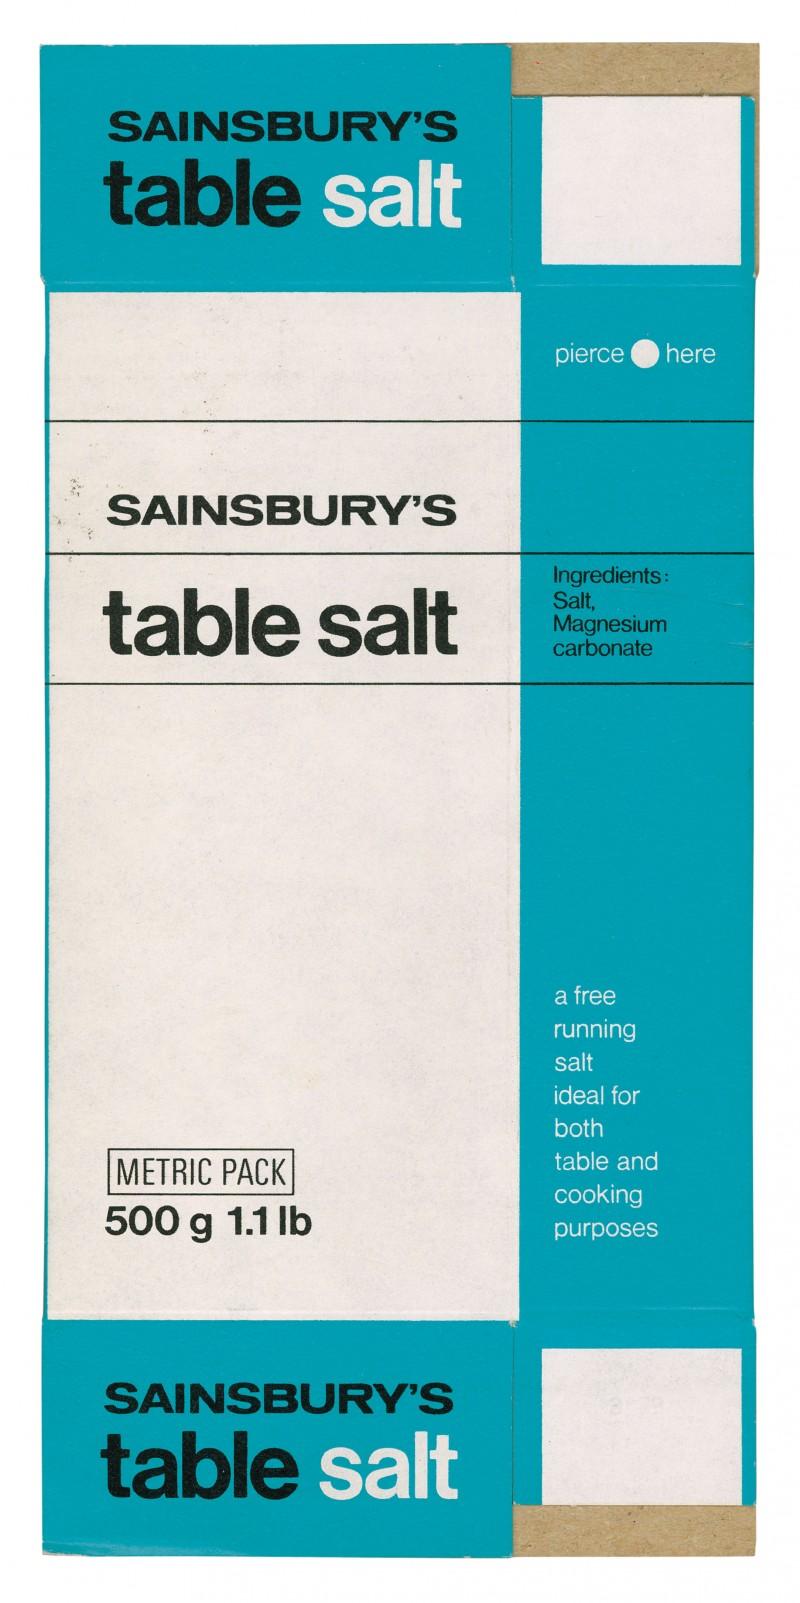 SA/PKC/PRO/1/14/2/1/4/1 - Sainsbury's Table Salt 500g 1.1lb packet, c. 1978